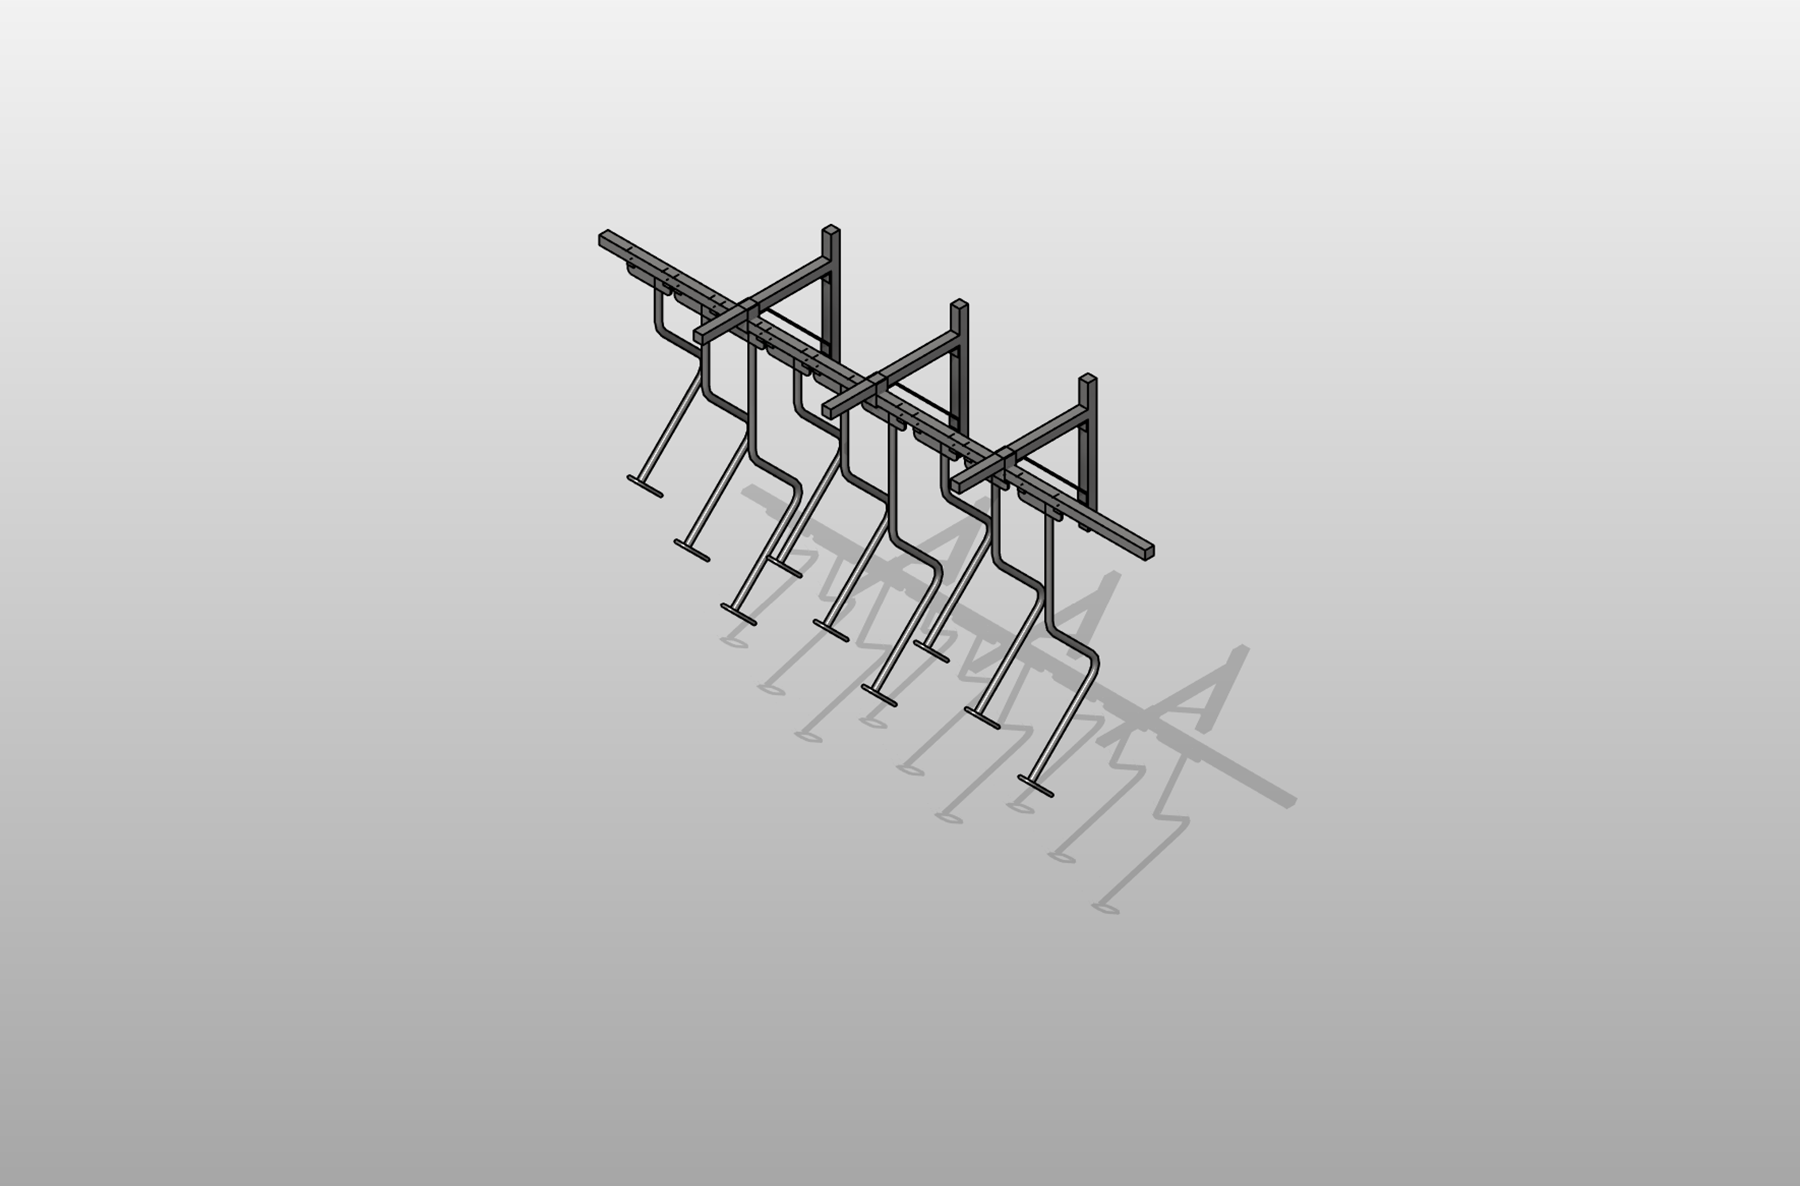 ssg_rack_bike_sliding_hook _wall _ceiling-large